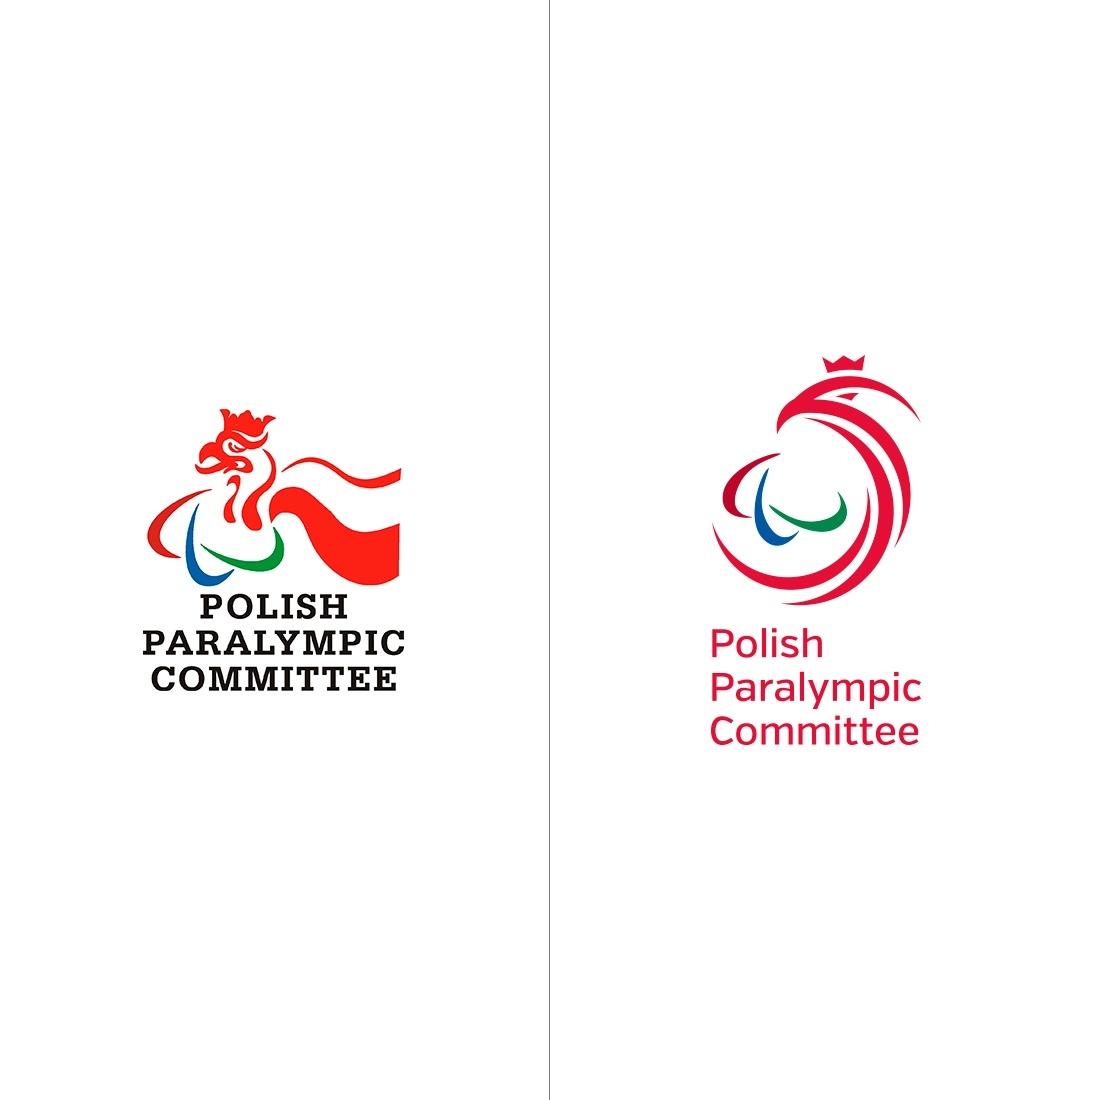 https://ponad.pl/wp-content/uploads/2015/10/polski-komitet-paraolimpijski-nowe-logo-historia-znaku.jpg